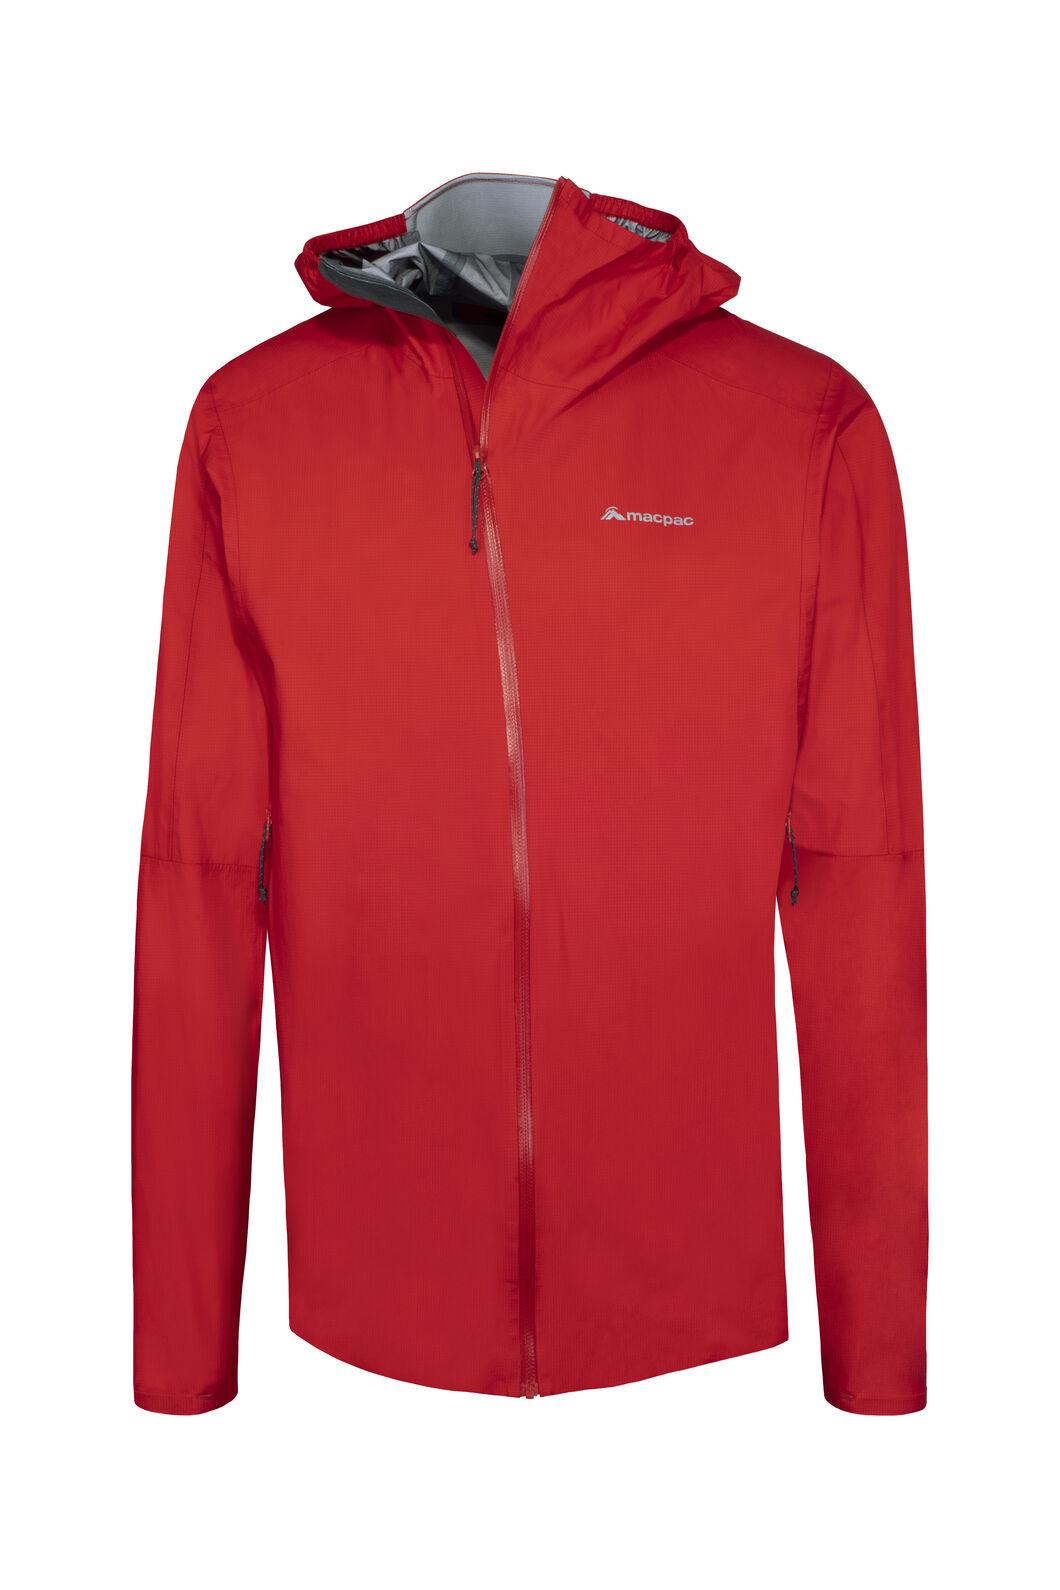 Macpac Nazomi Pertex® Rain Jacket — Men's, Flame Scarlet, hi-res